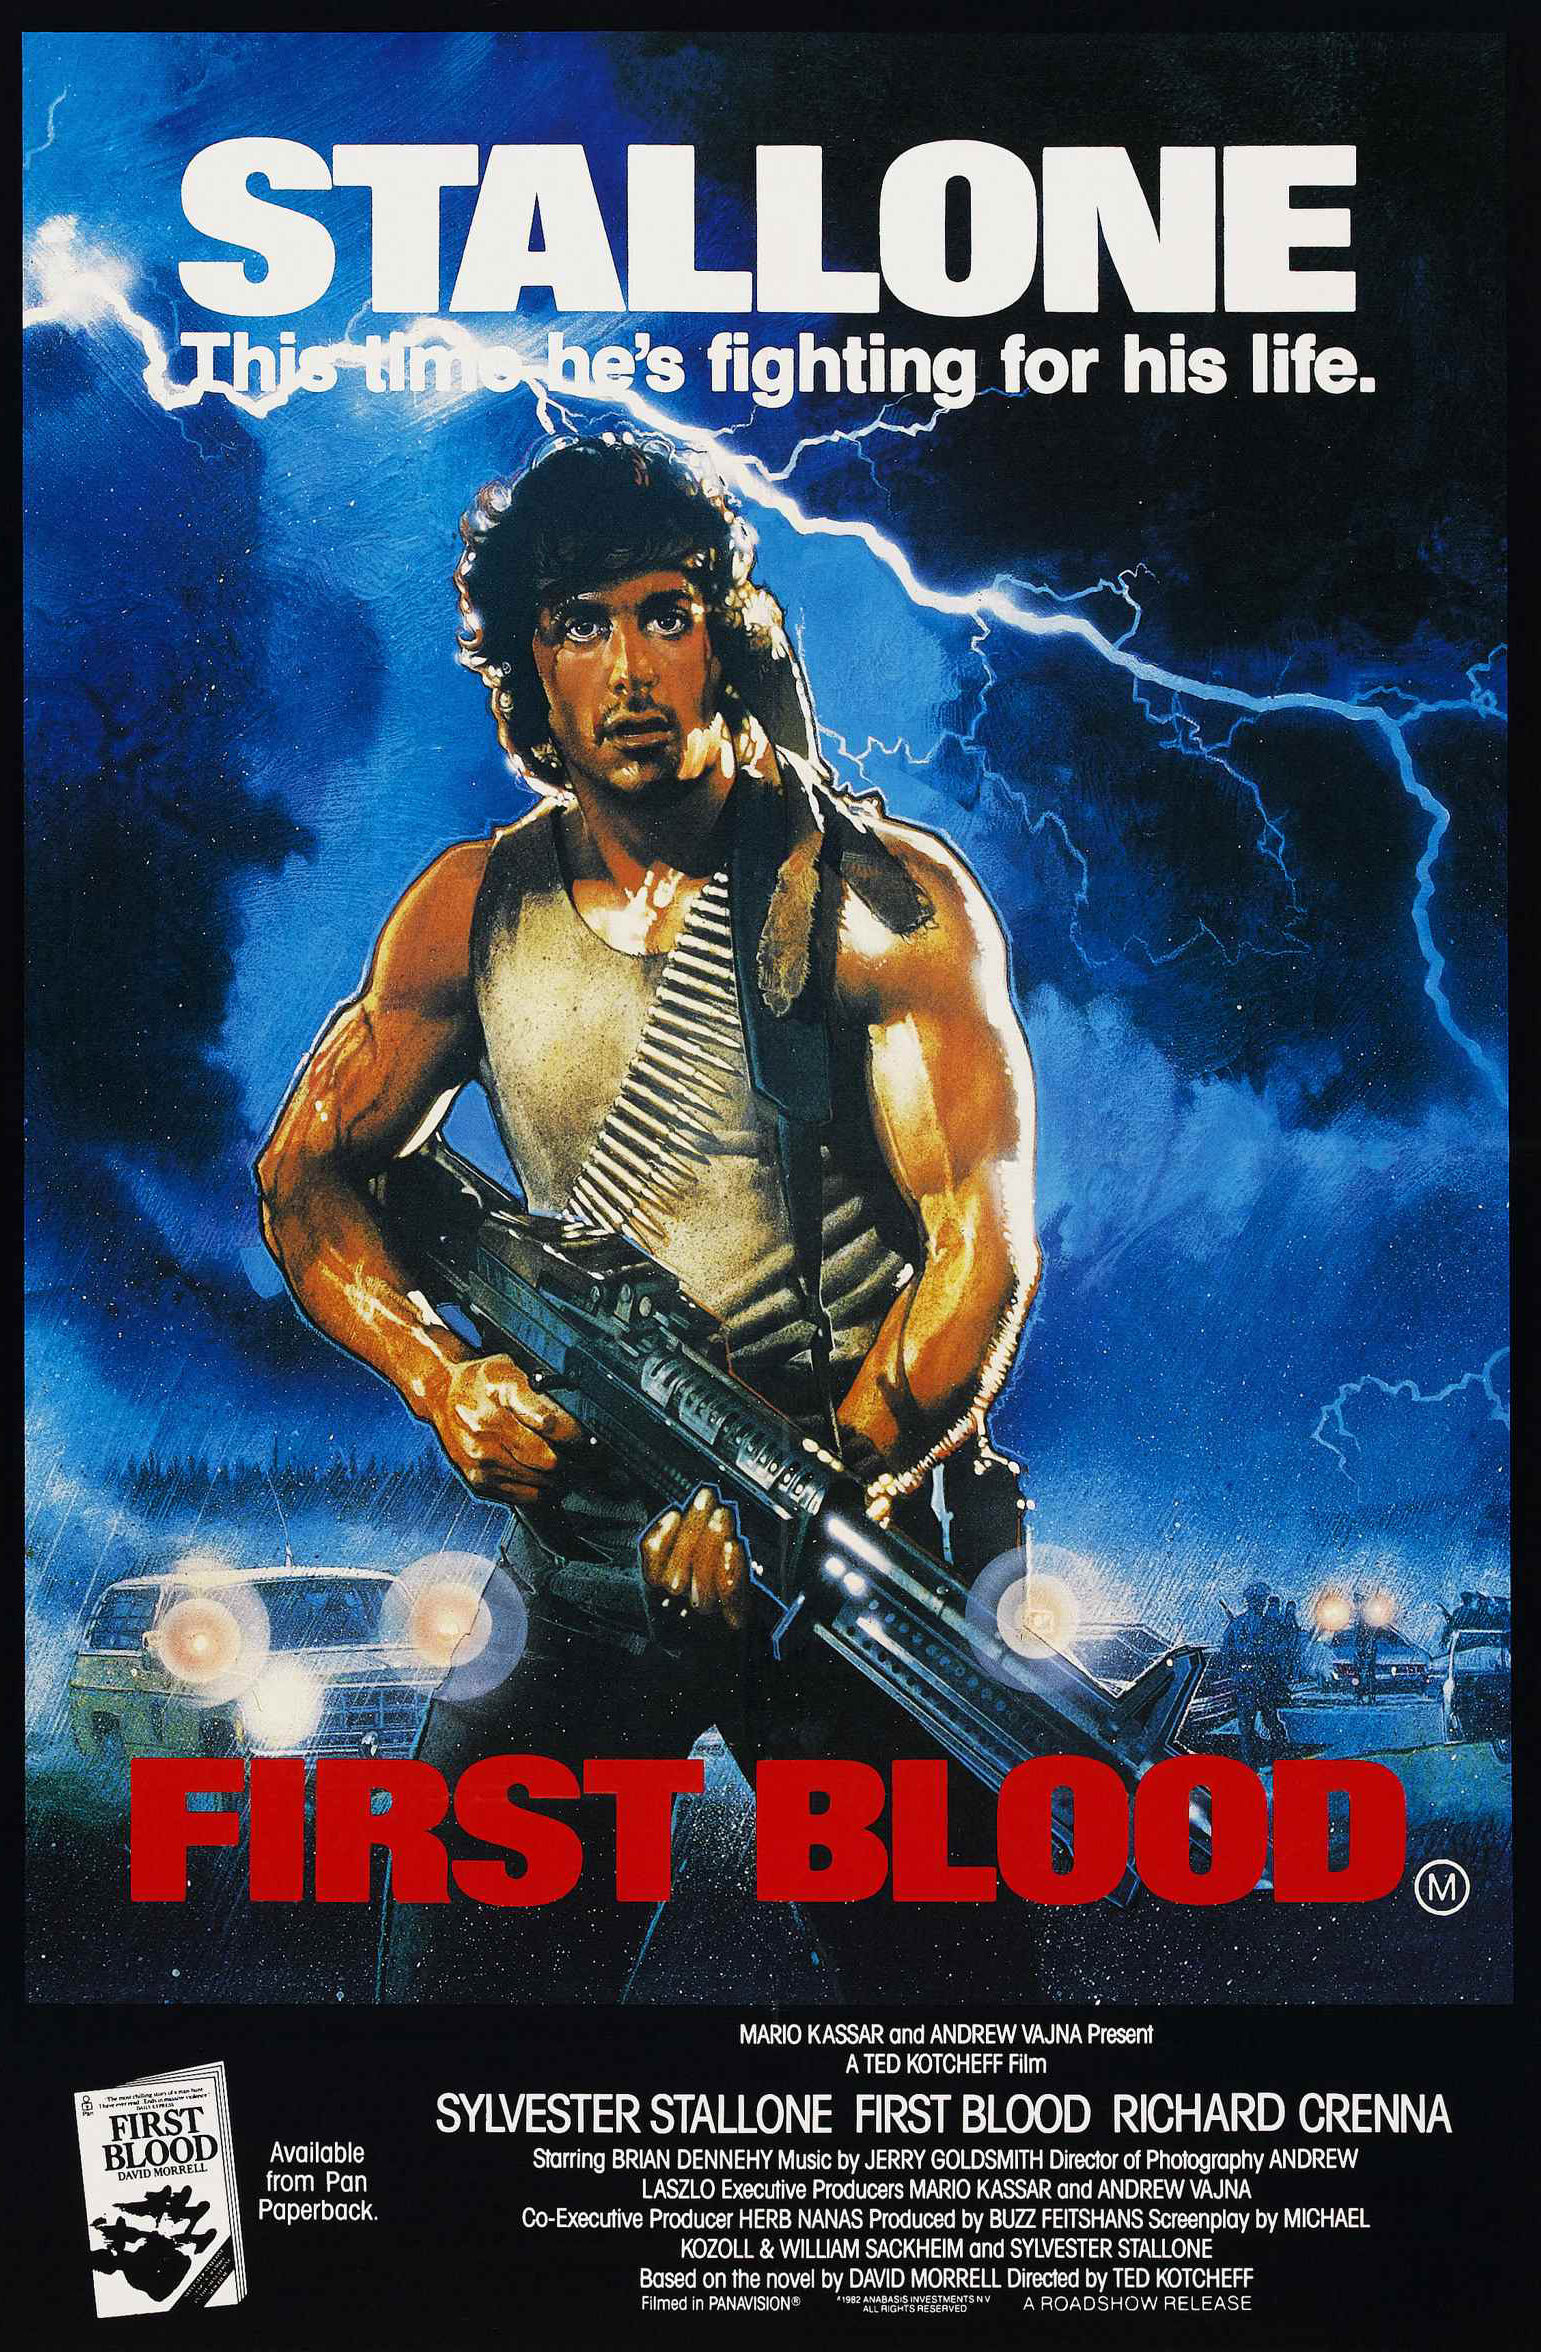 first-blood-1982-ted-kotcheff.jpg